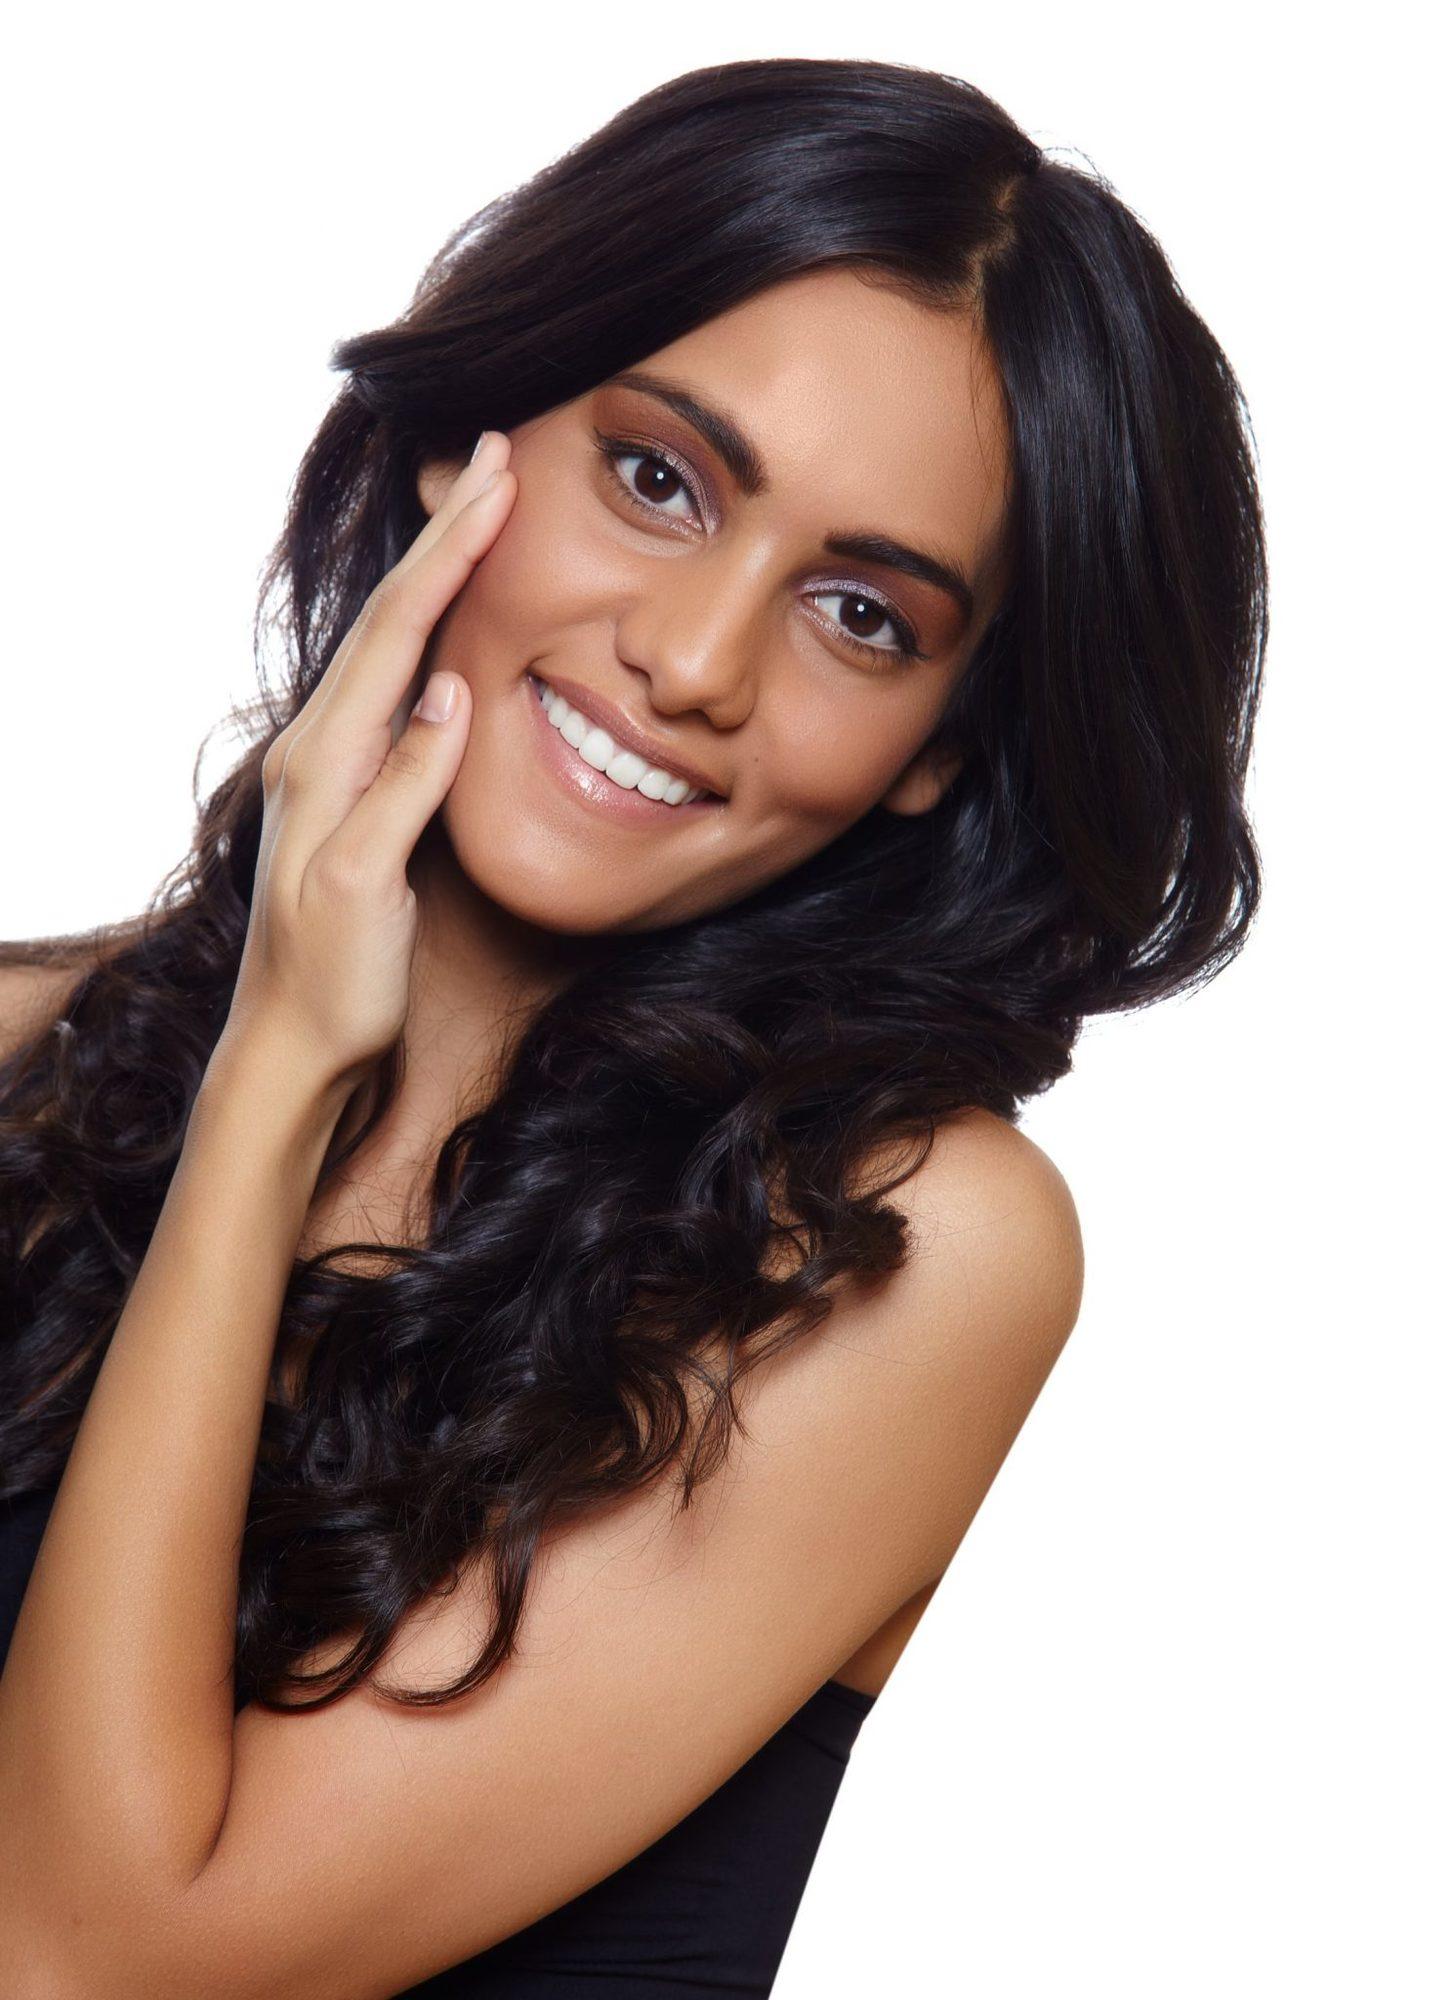 benefits of TMJ treatment